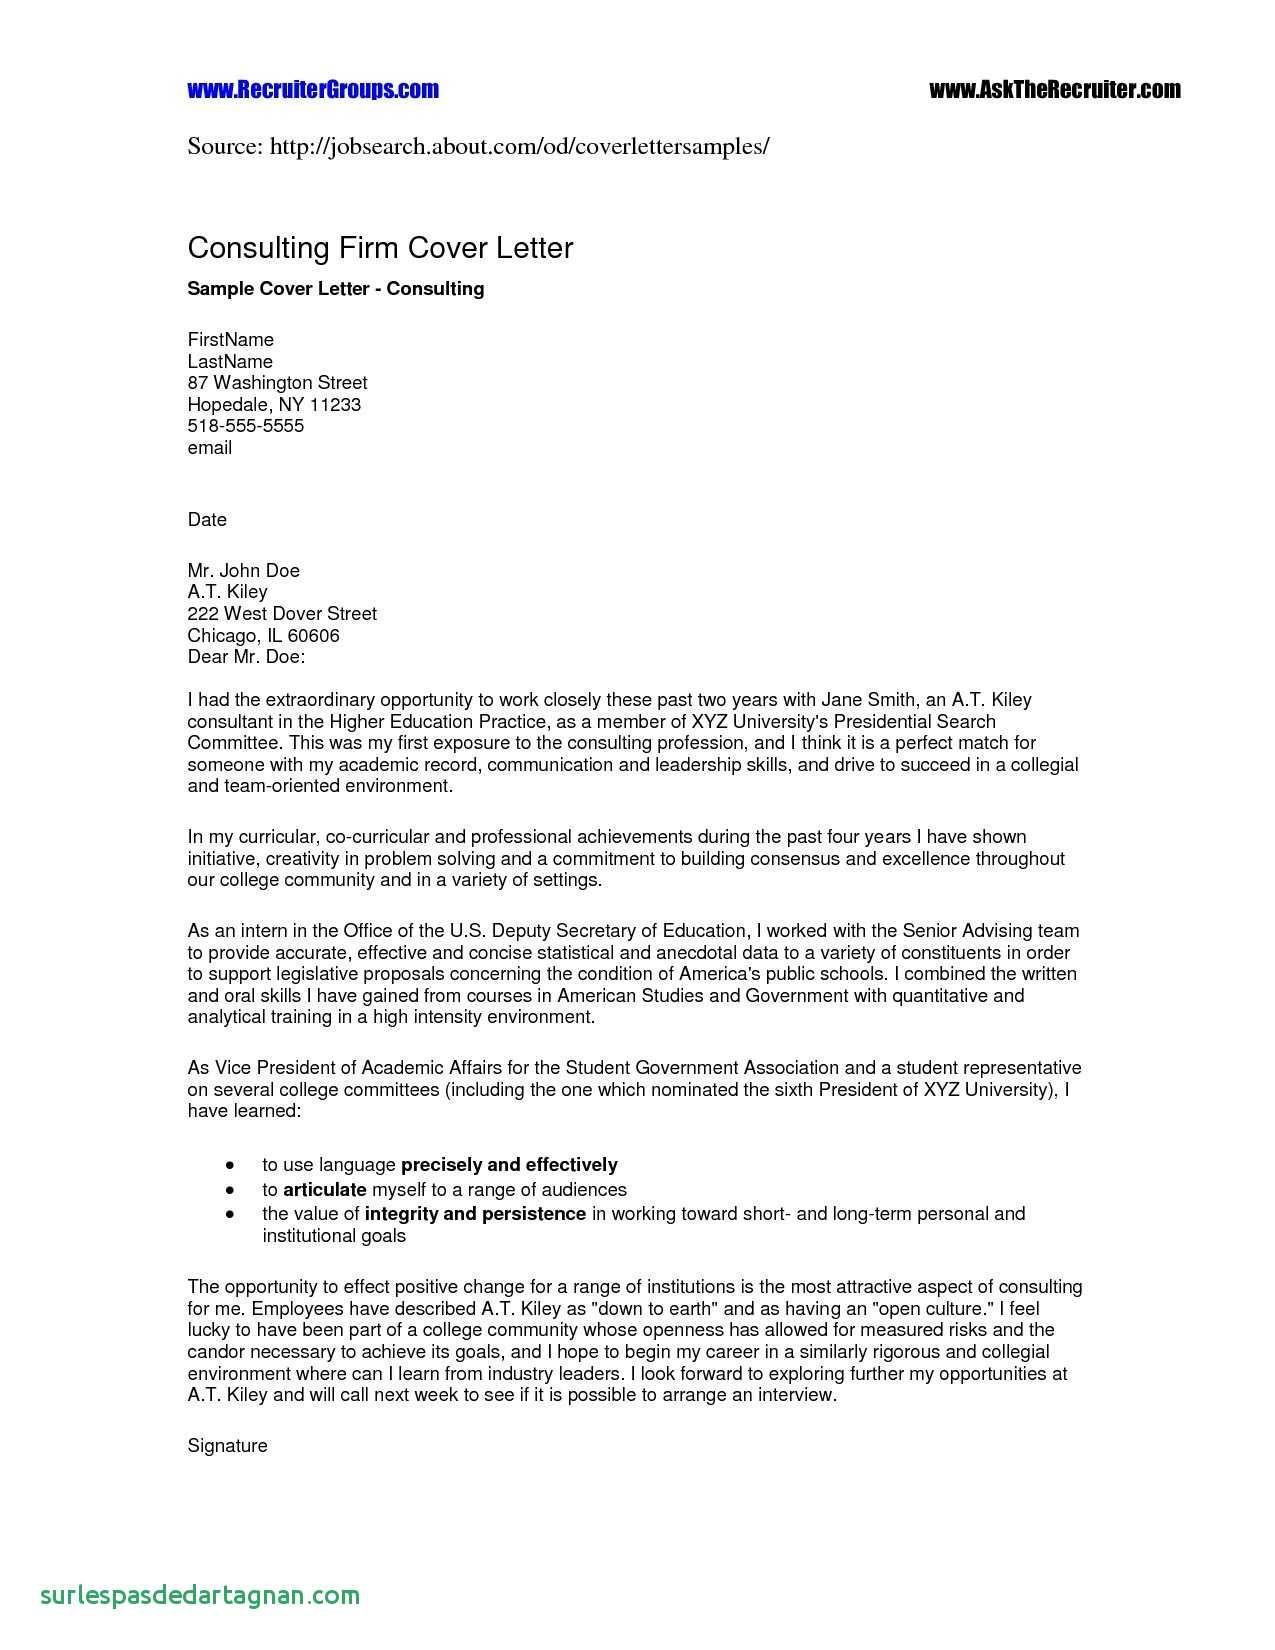 Google Docs Letter Template - Business Letter Template Google Docs Best Business Receipt Templates